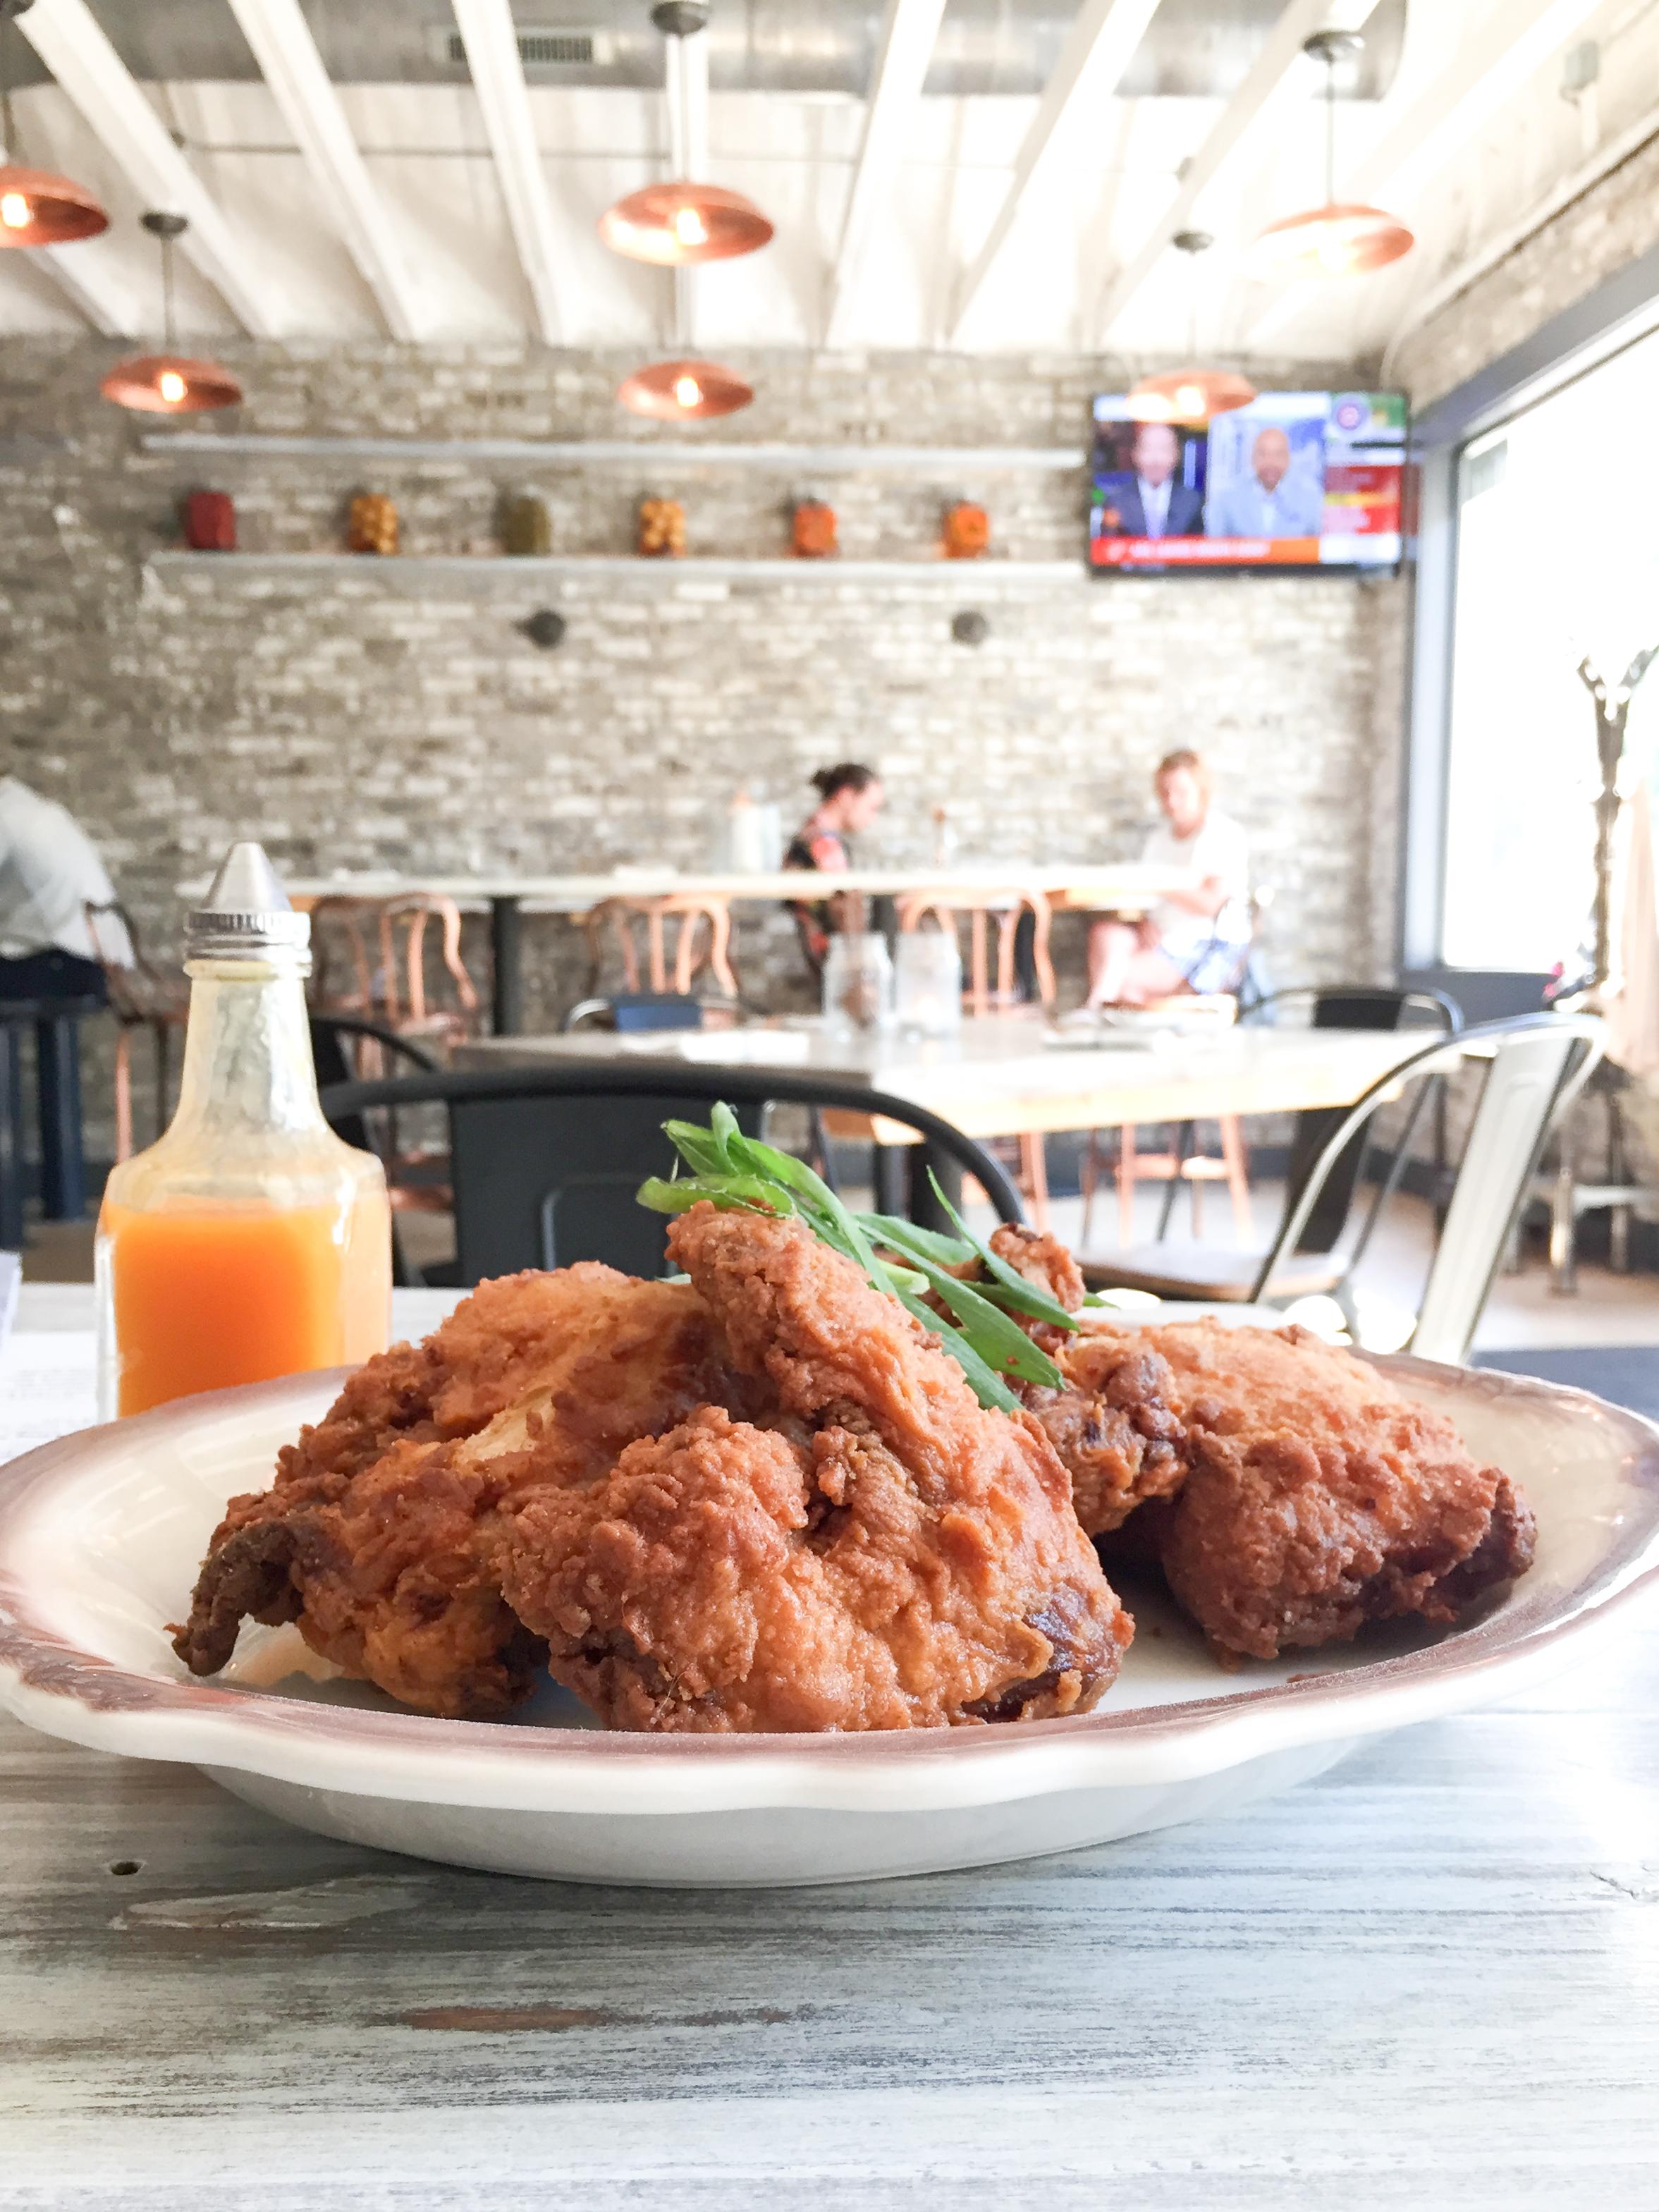 haberdish-noda-charlotte-nc-fried-chicken